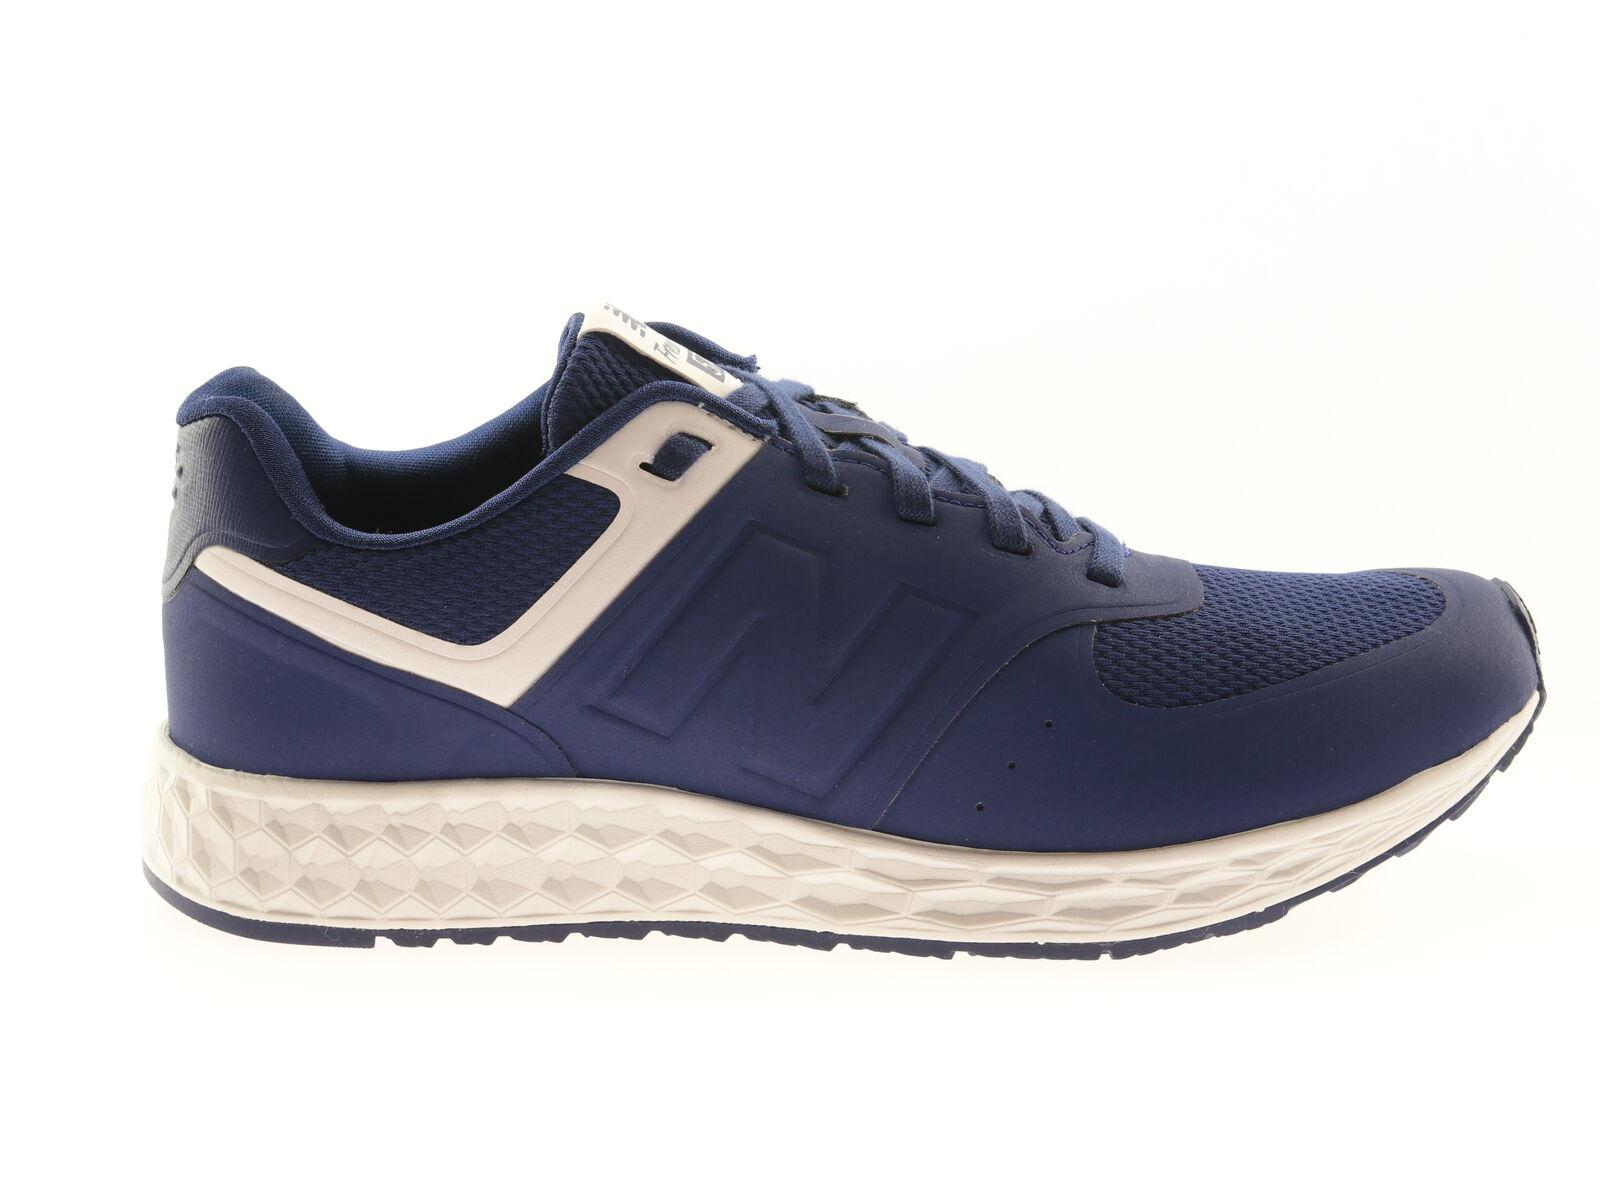 New Balance WFL574BW Unisex-Turnschuhe Textil Sportschuhe Blau Laufschuhe